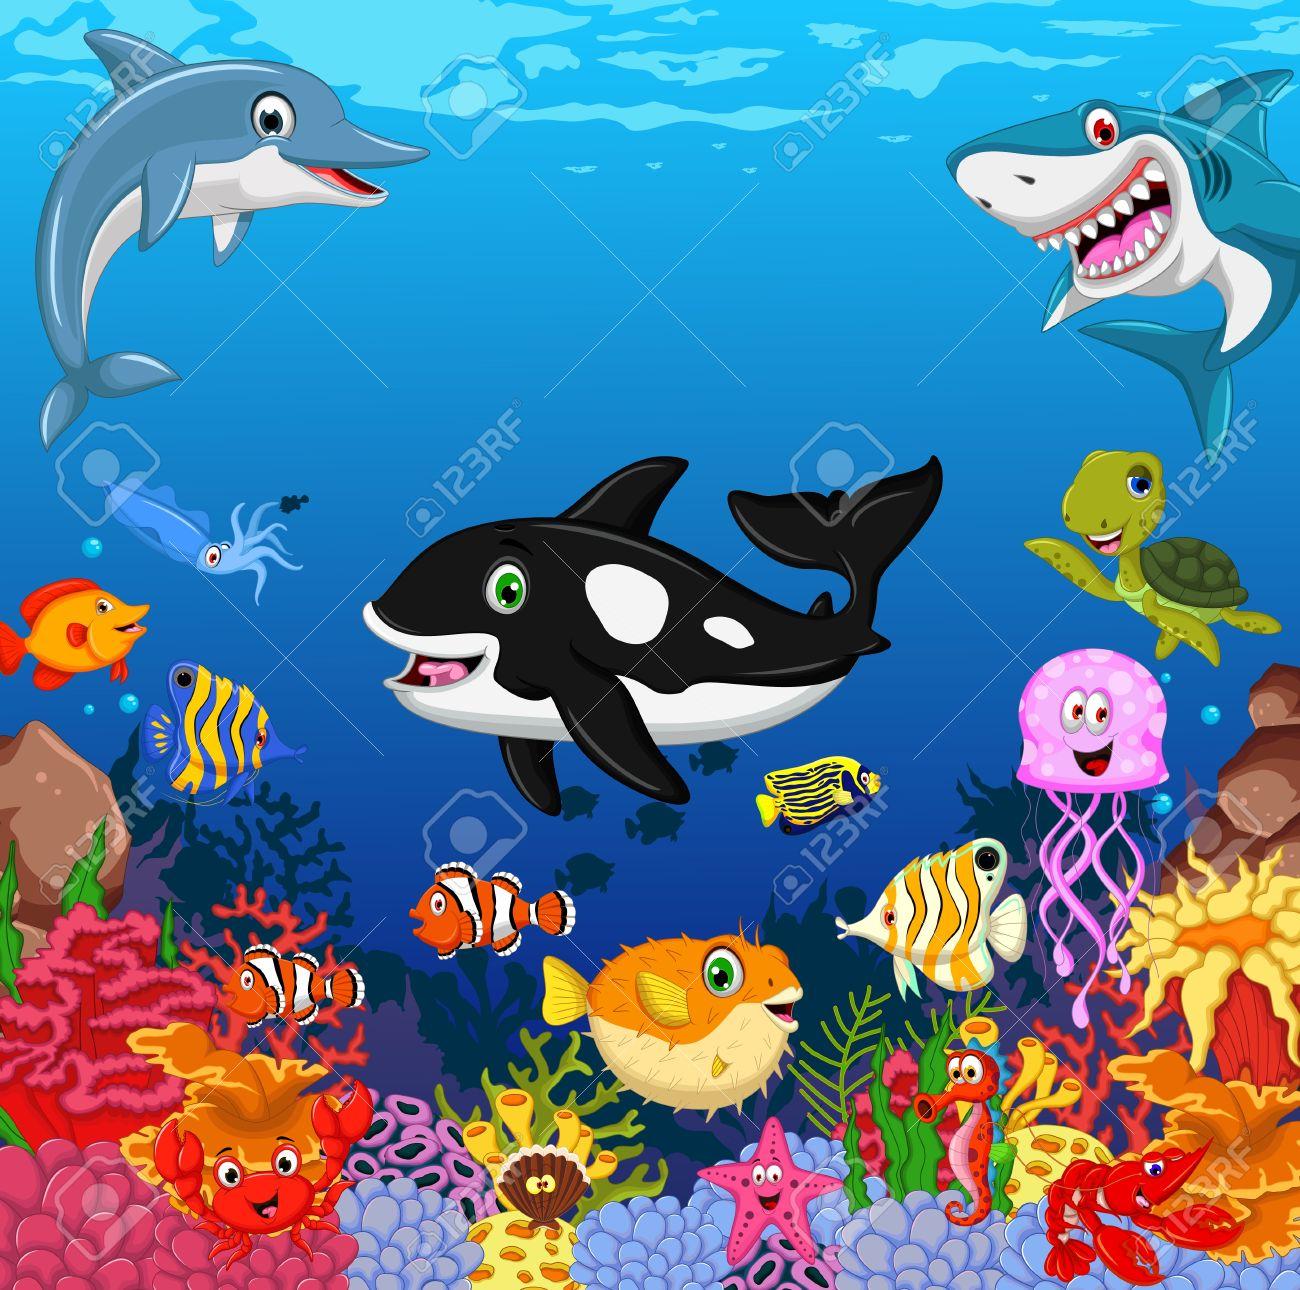 funny fish cartoon with sea life background - 56486174